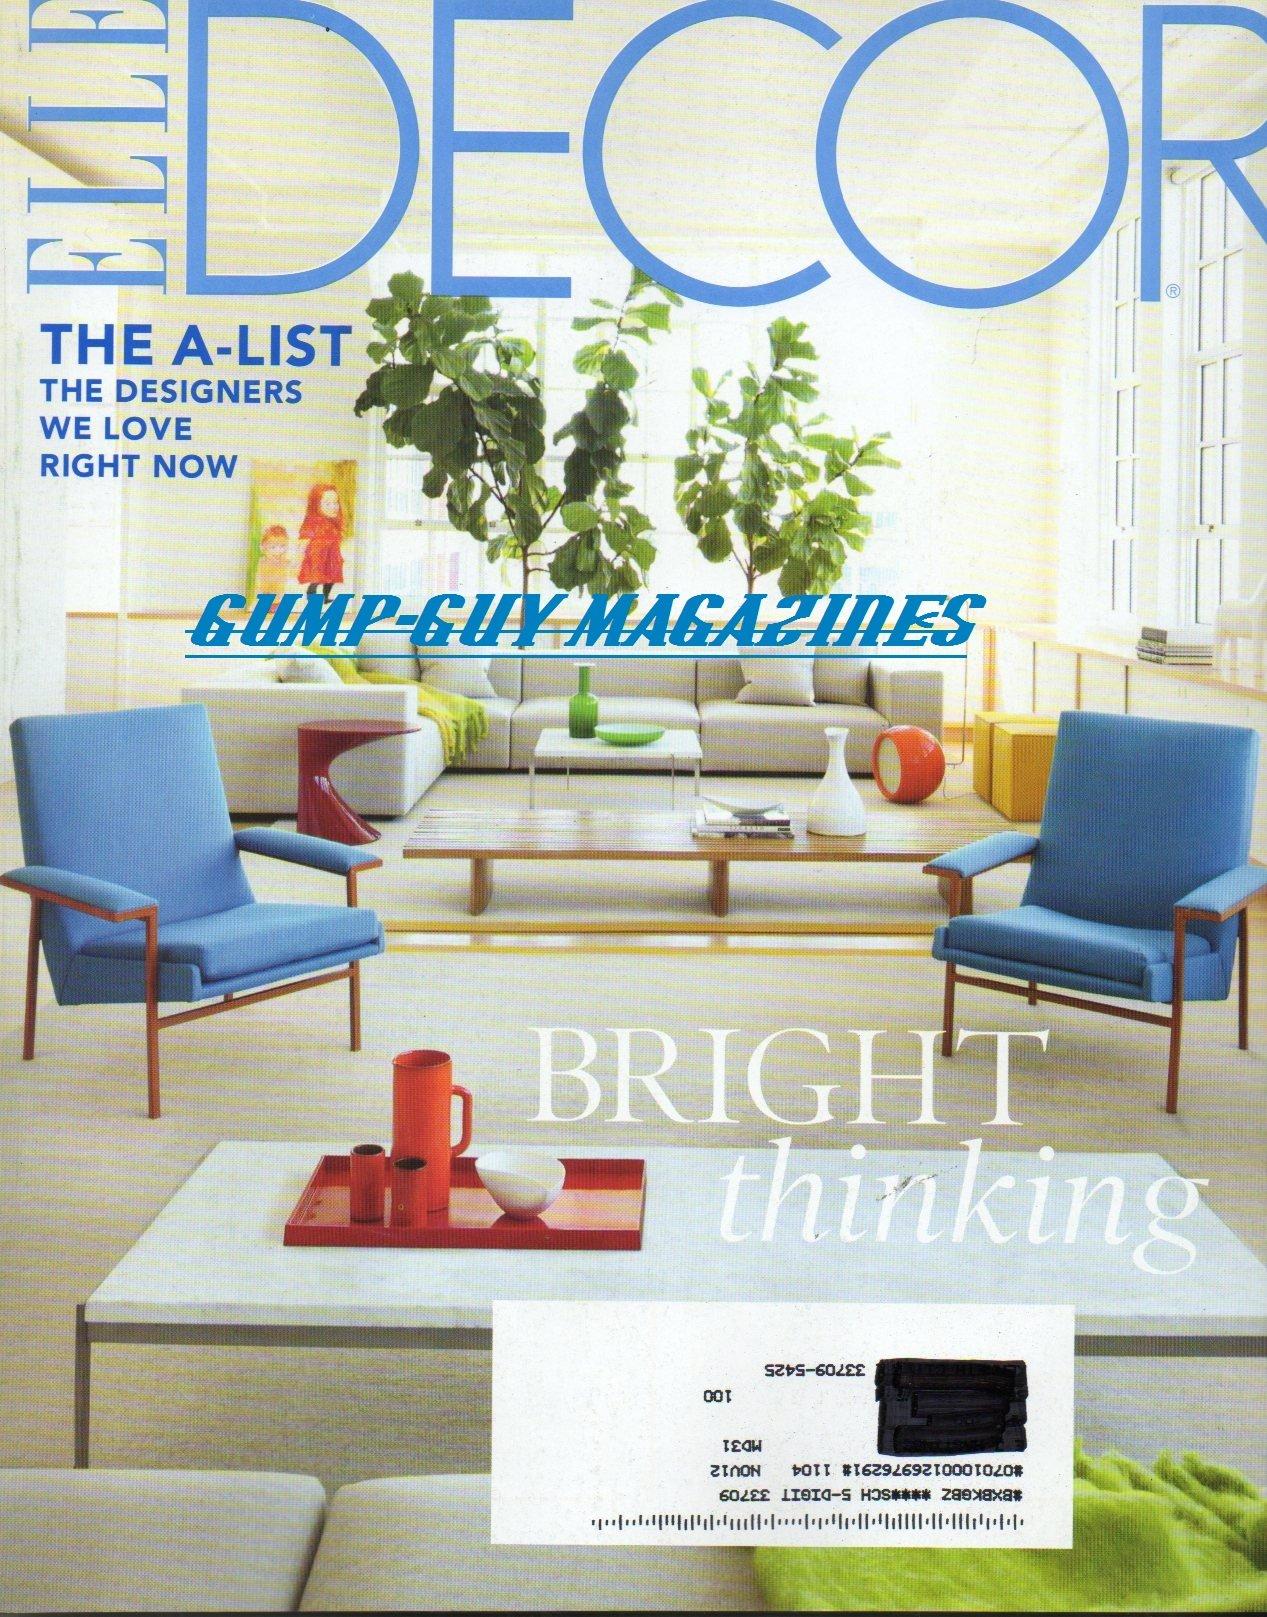 Download Elle Decor June 2011 Volume 22, No. 4 pdf